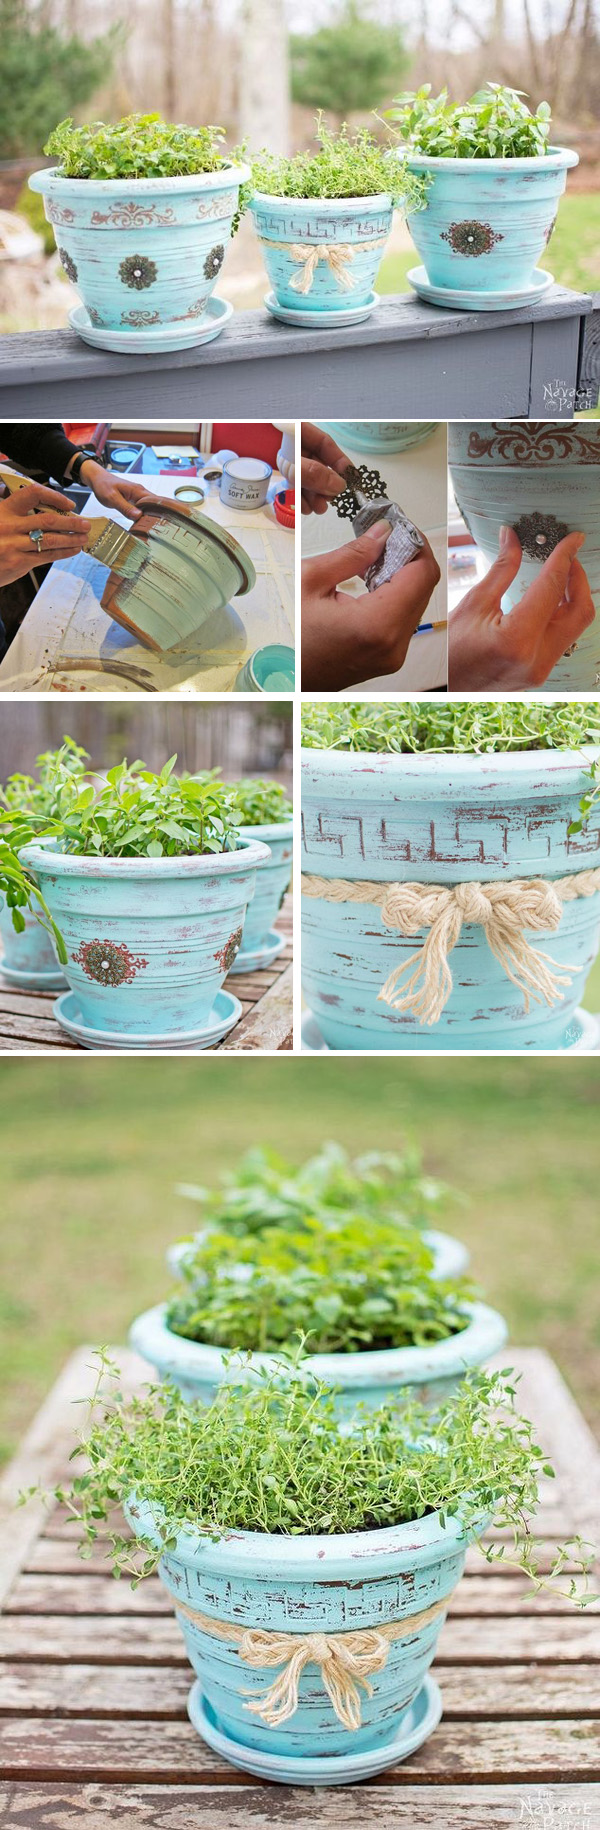 DIY ιδέες με γλάστρες3